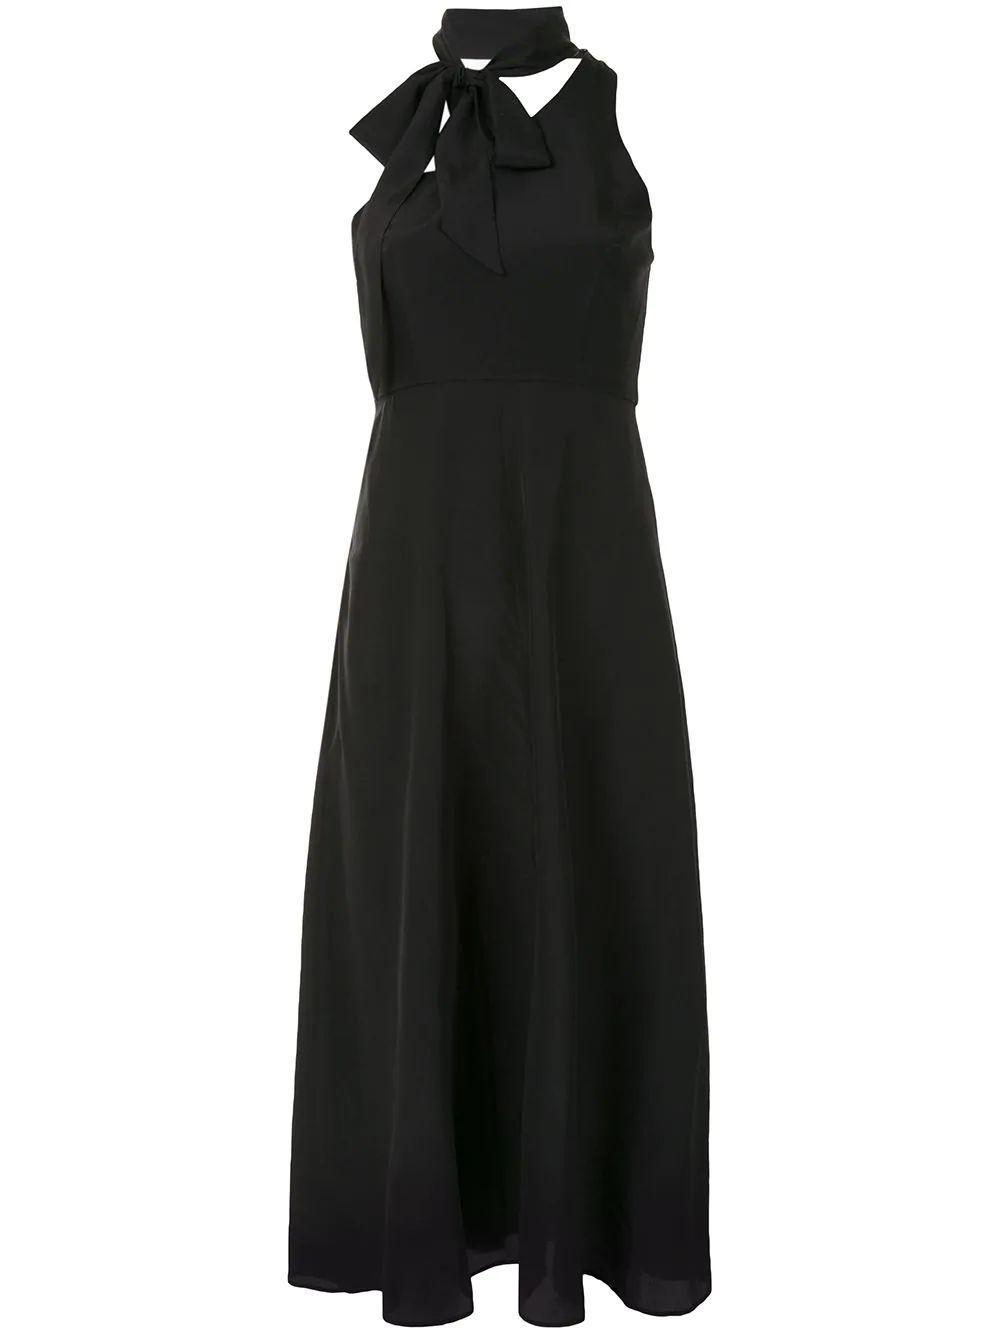 Silk Tie Picnic Dress Item # 9066DRLAD